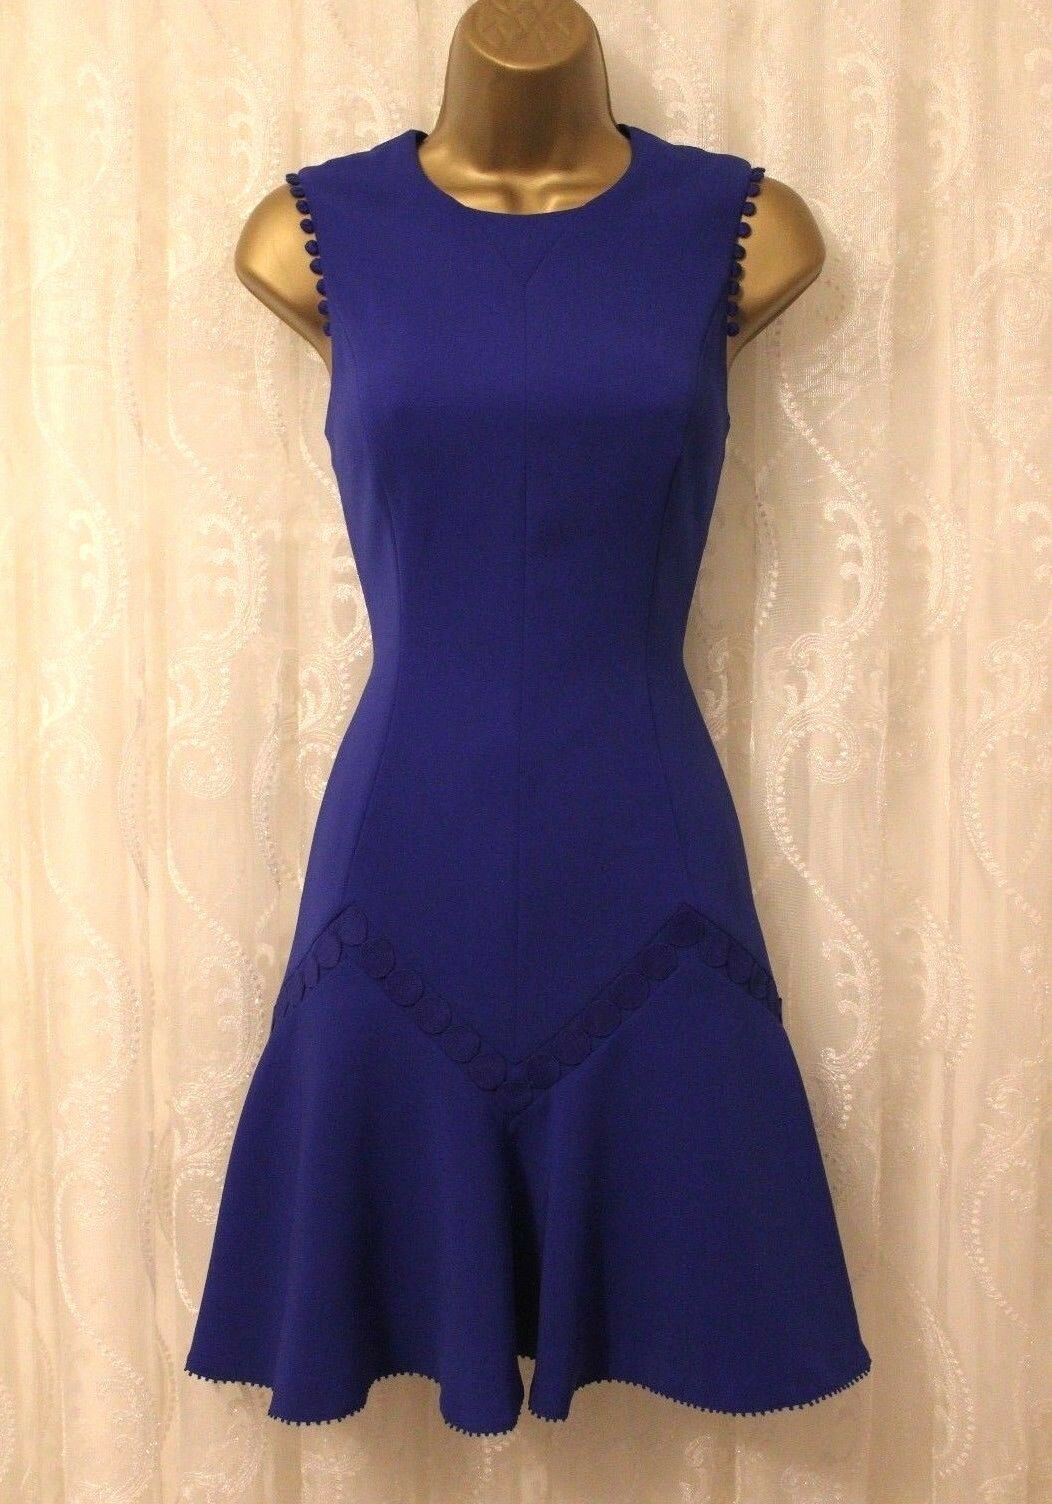 Karen Millen Blau DZ122 Flare Hem Fitted Shift Cocktail Party Mini Dress